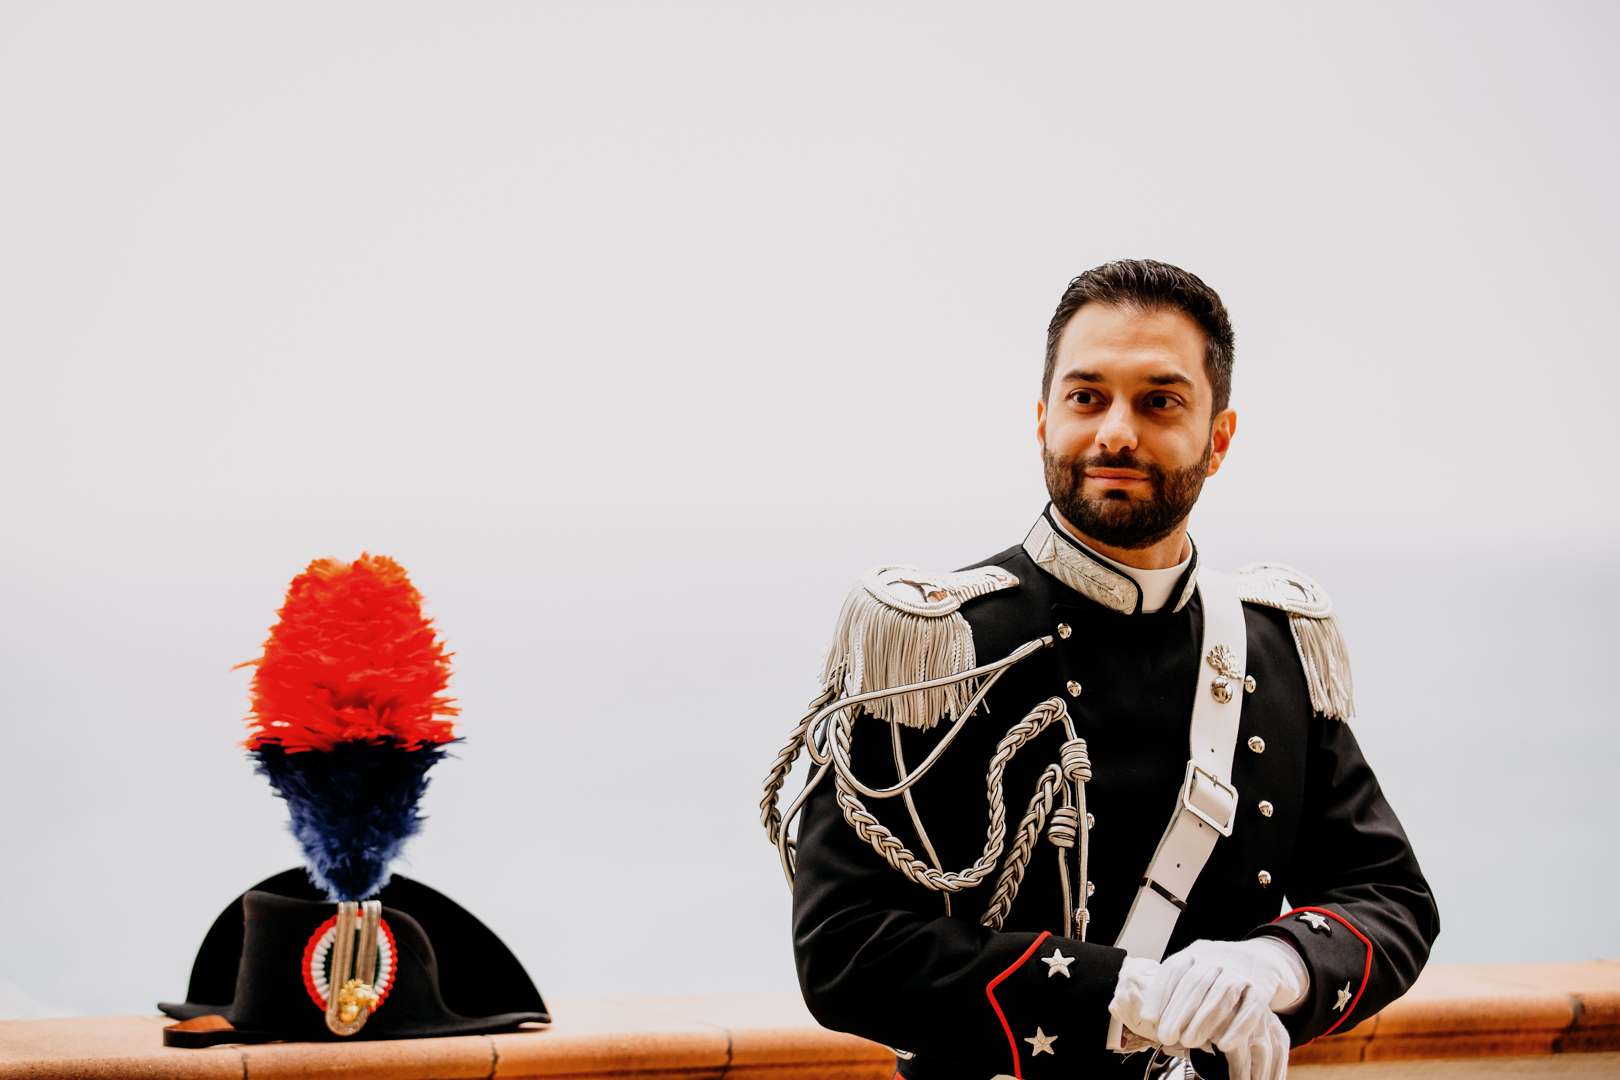 13 sposo-ritratto-gargano-matrimonio-carabiniere-gianni-lepore-photographer